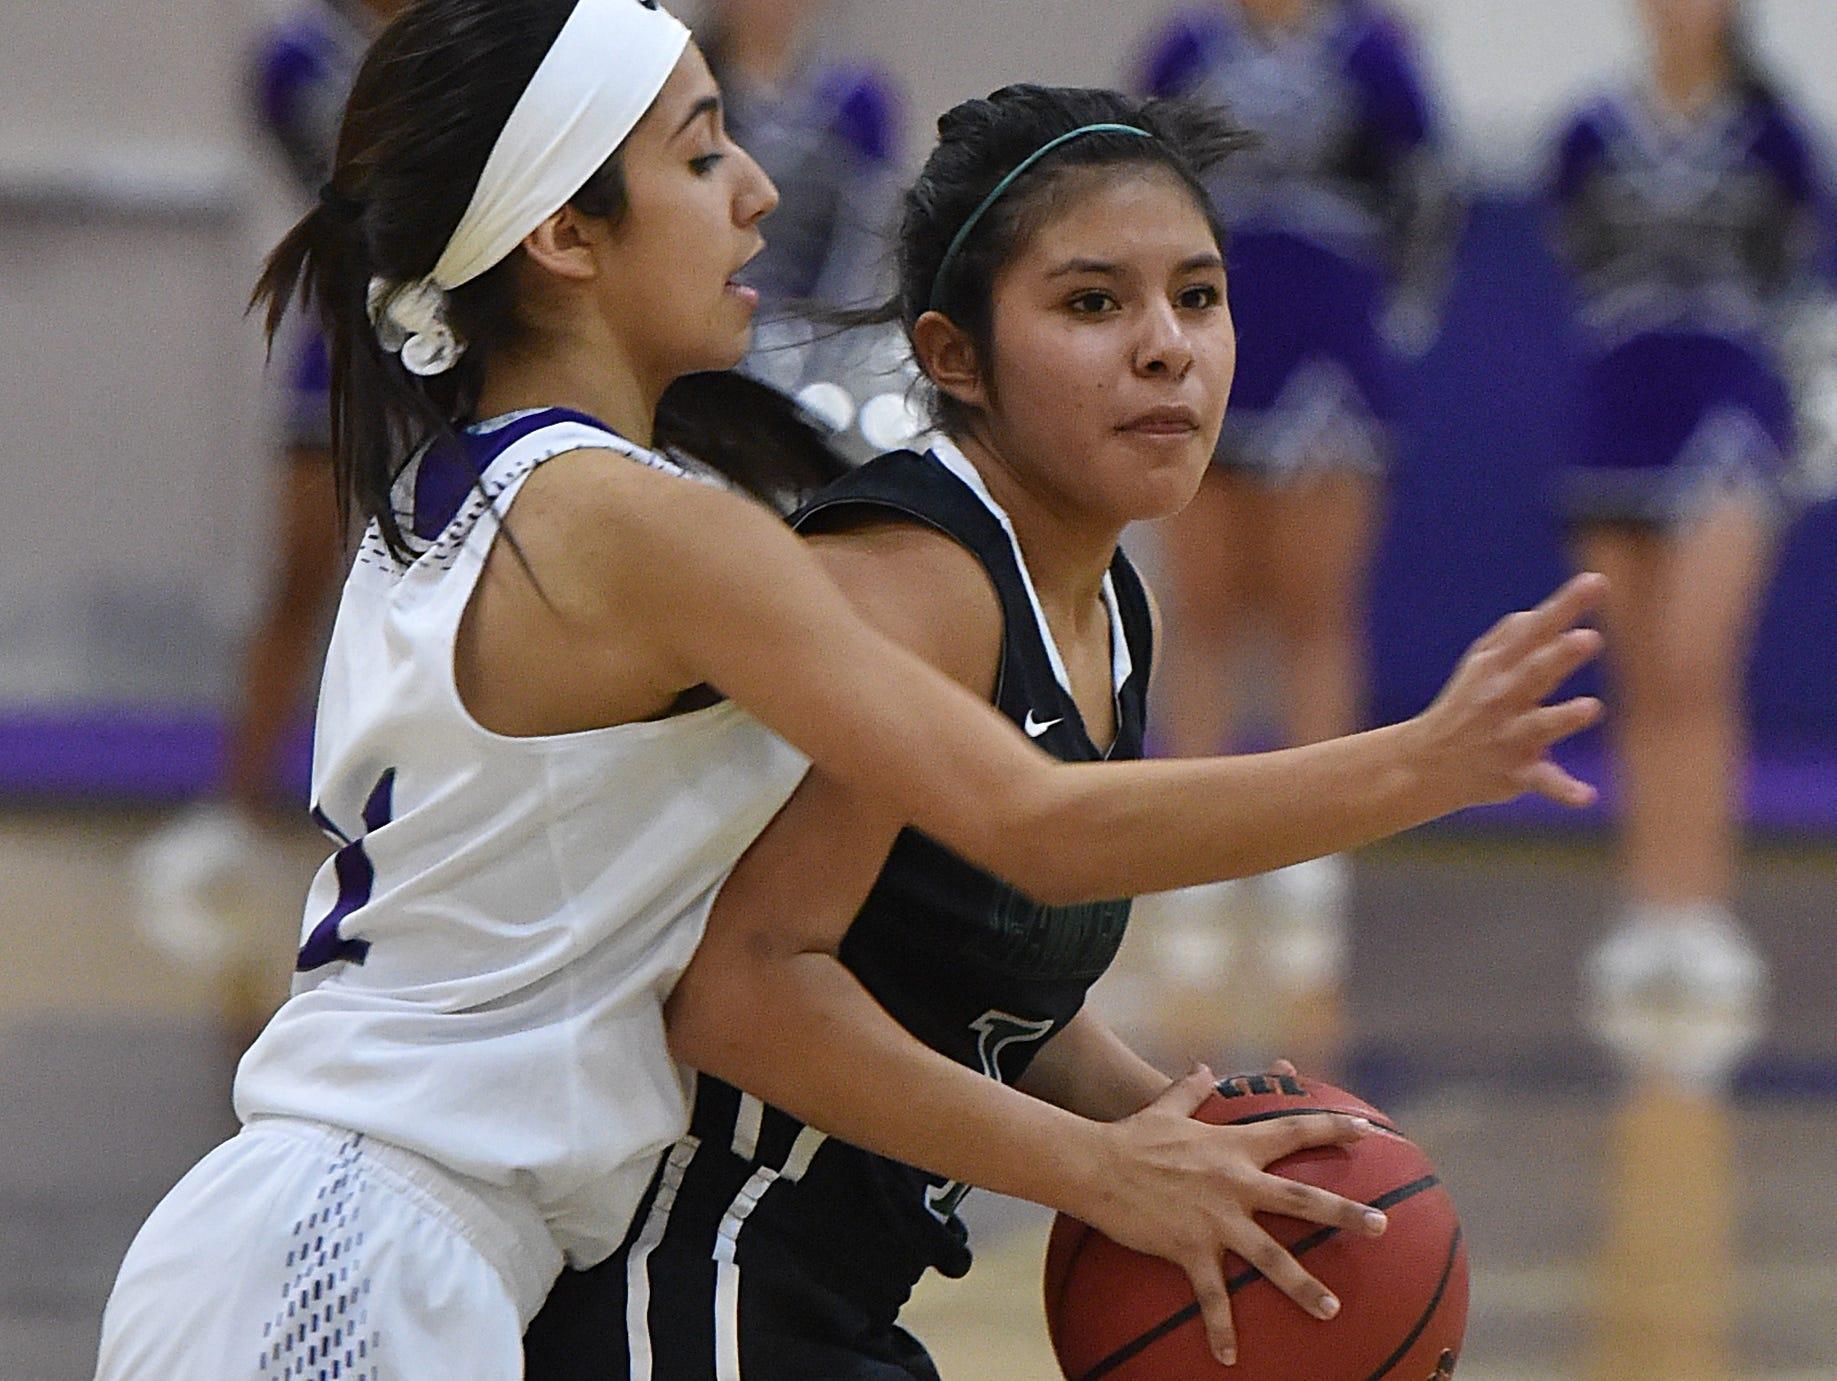 Spanish Springs' Naelia Pinedo pressures Hug's Jammie Moreno during Tuesday's game at Spanish Springs.